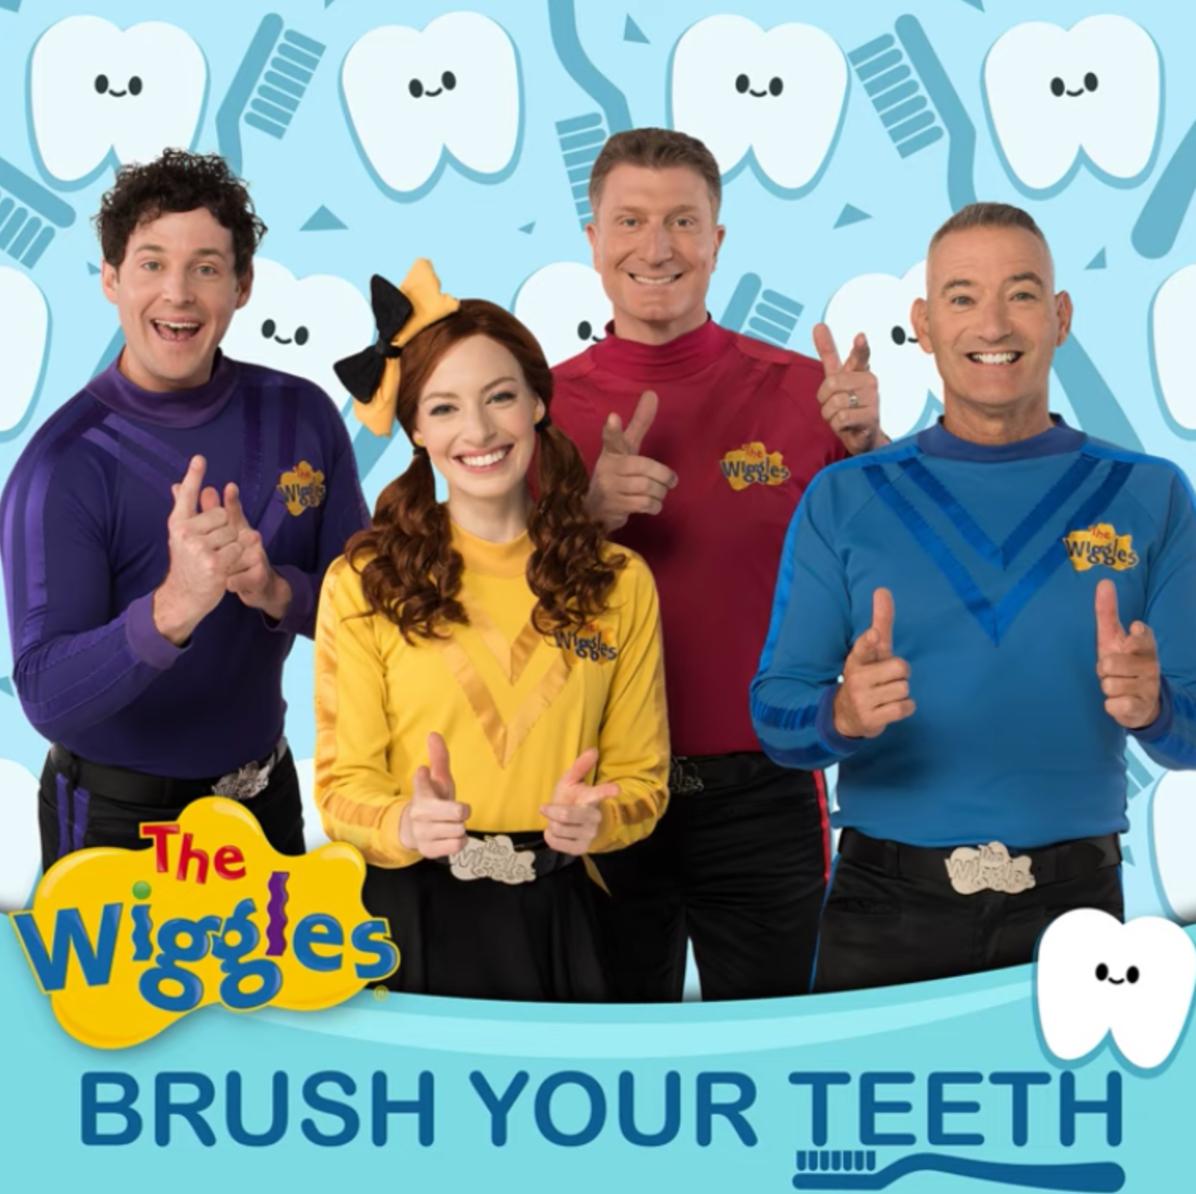 Brush Your Teeth (single)